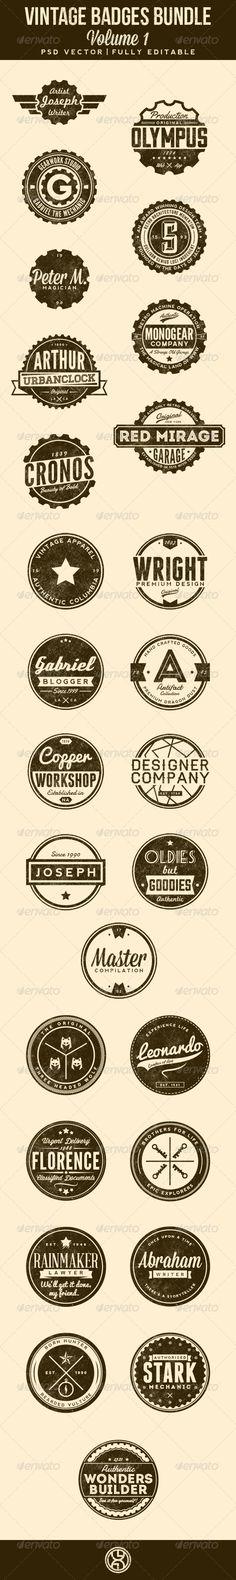 27 Vintage Badges Bundle Template | Buy and Download: http://graphicriver.net/item/27-vintage-badges-bundle-volume-1/7306340?WT.ac=category_thumb&WT.z_author=mining&ref=ksioks